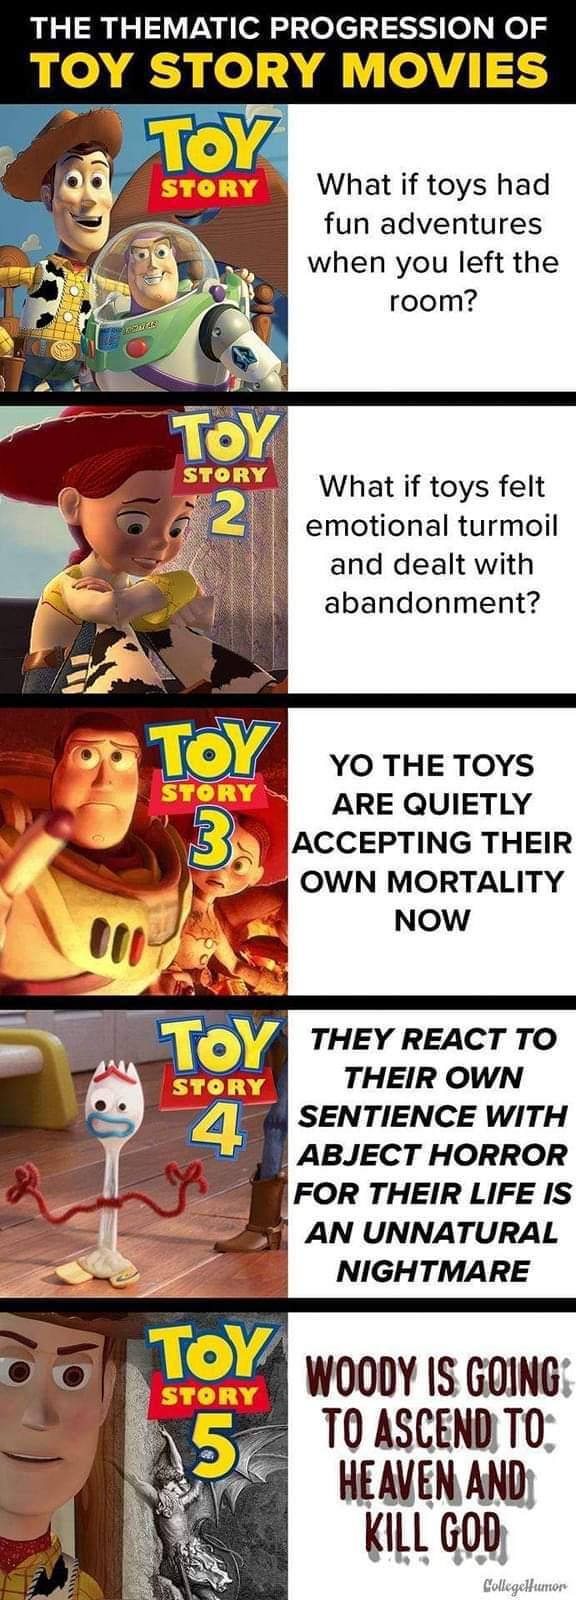 Yrots Yot - meme